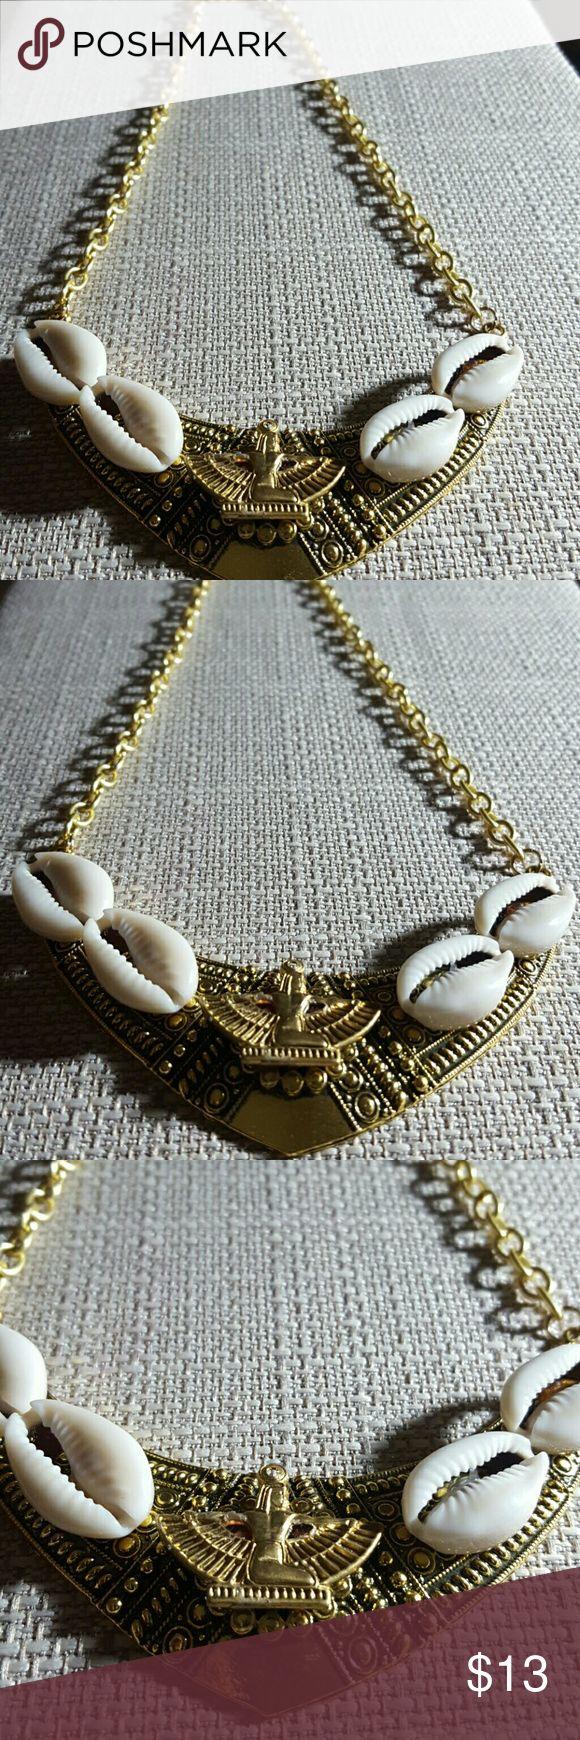 Ancient Egyptian Matt cowrie shells necklace Ancient Egyptian Matt cowrie shells necklace Jewelry Necklaces